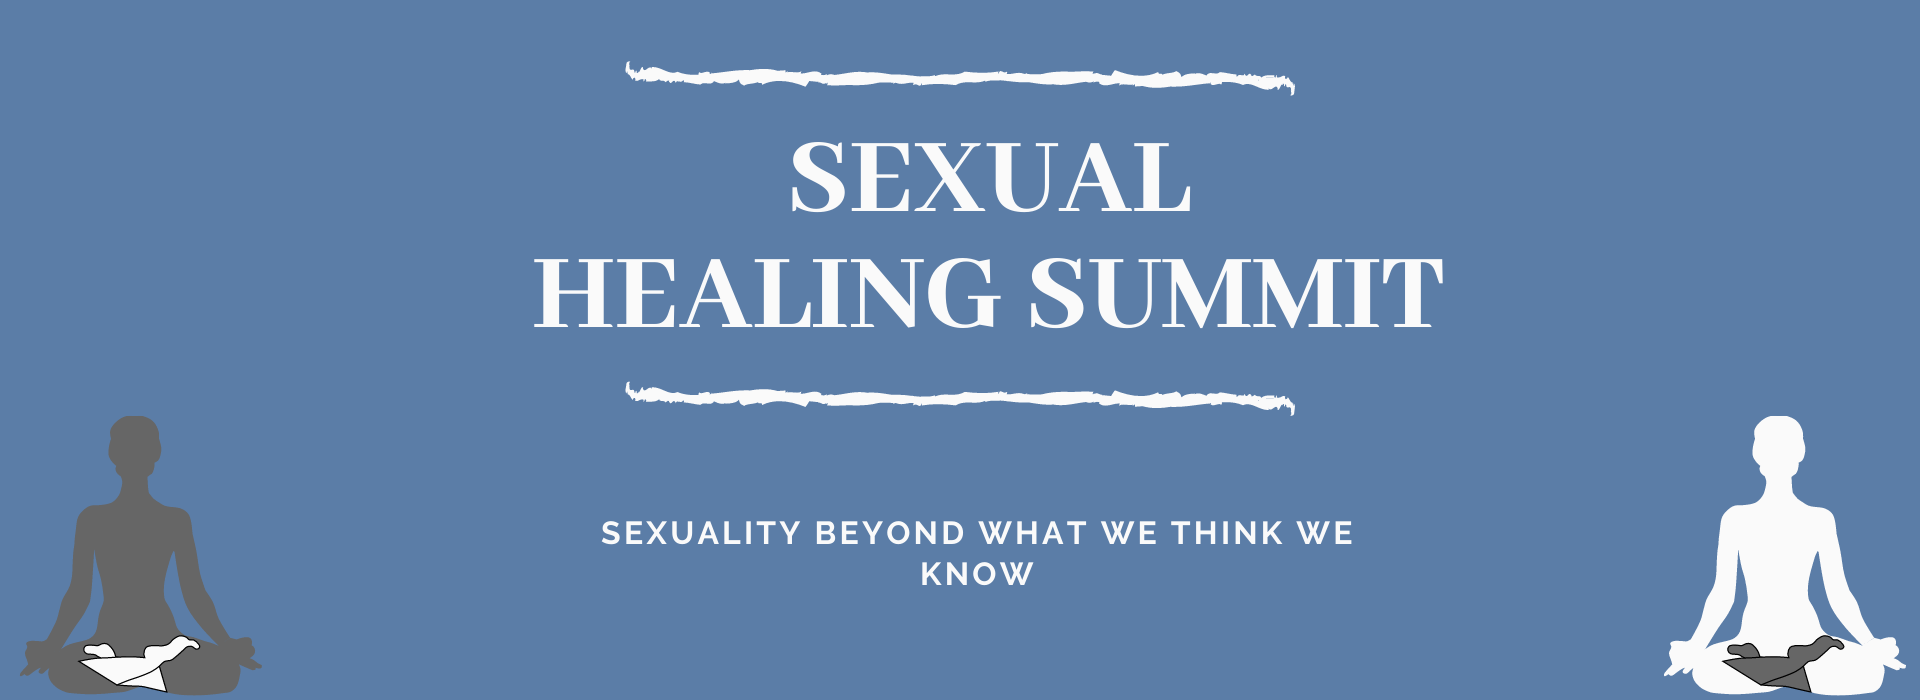 Sexual Healing Summit